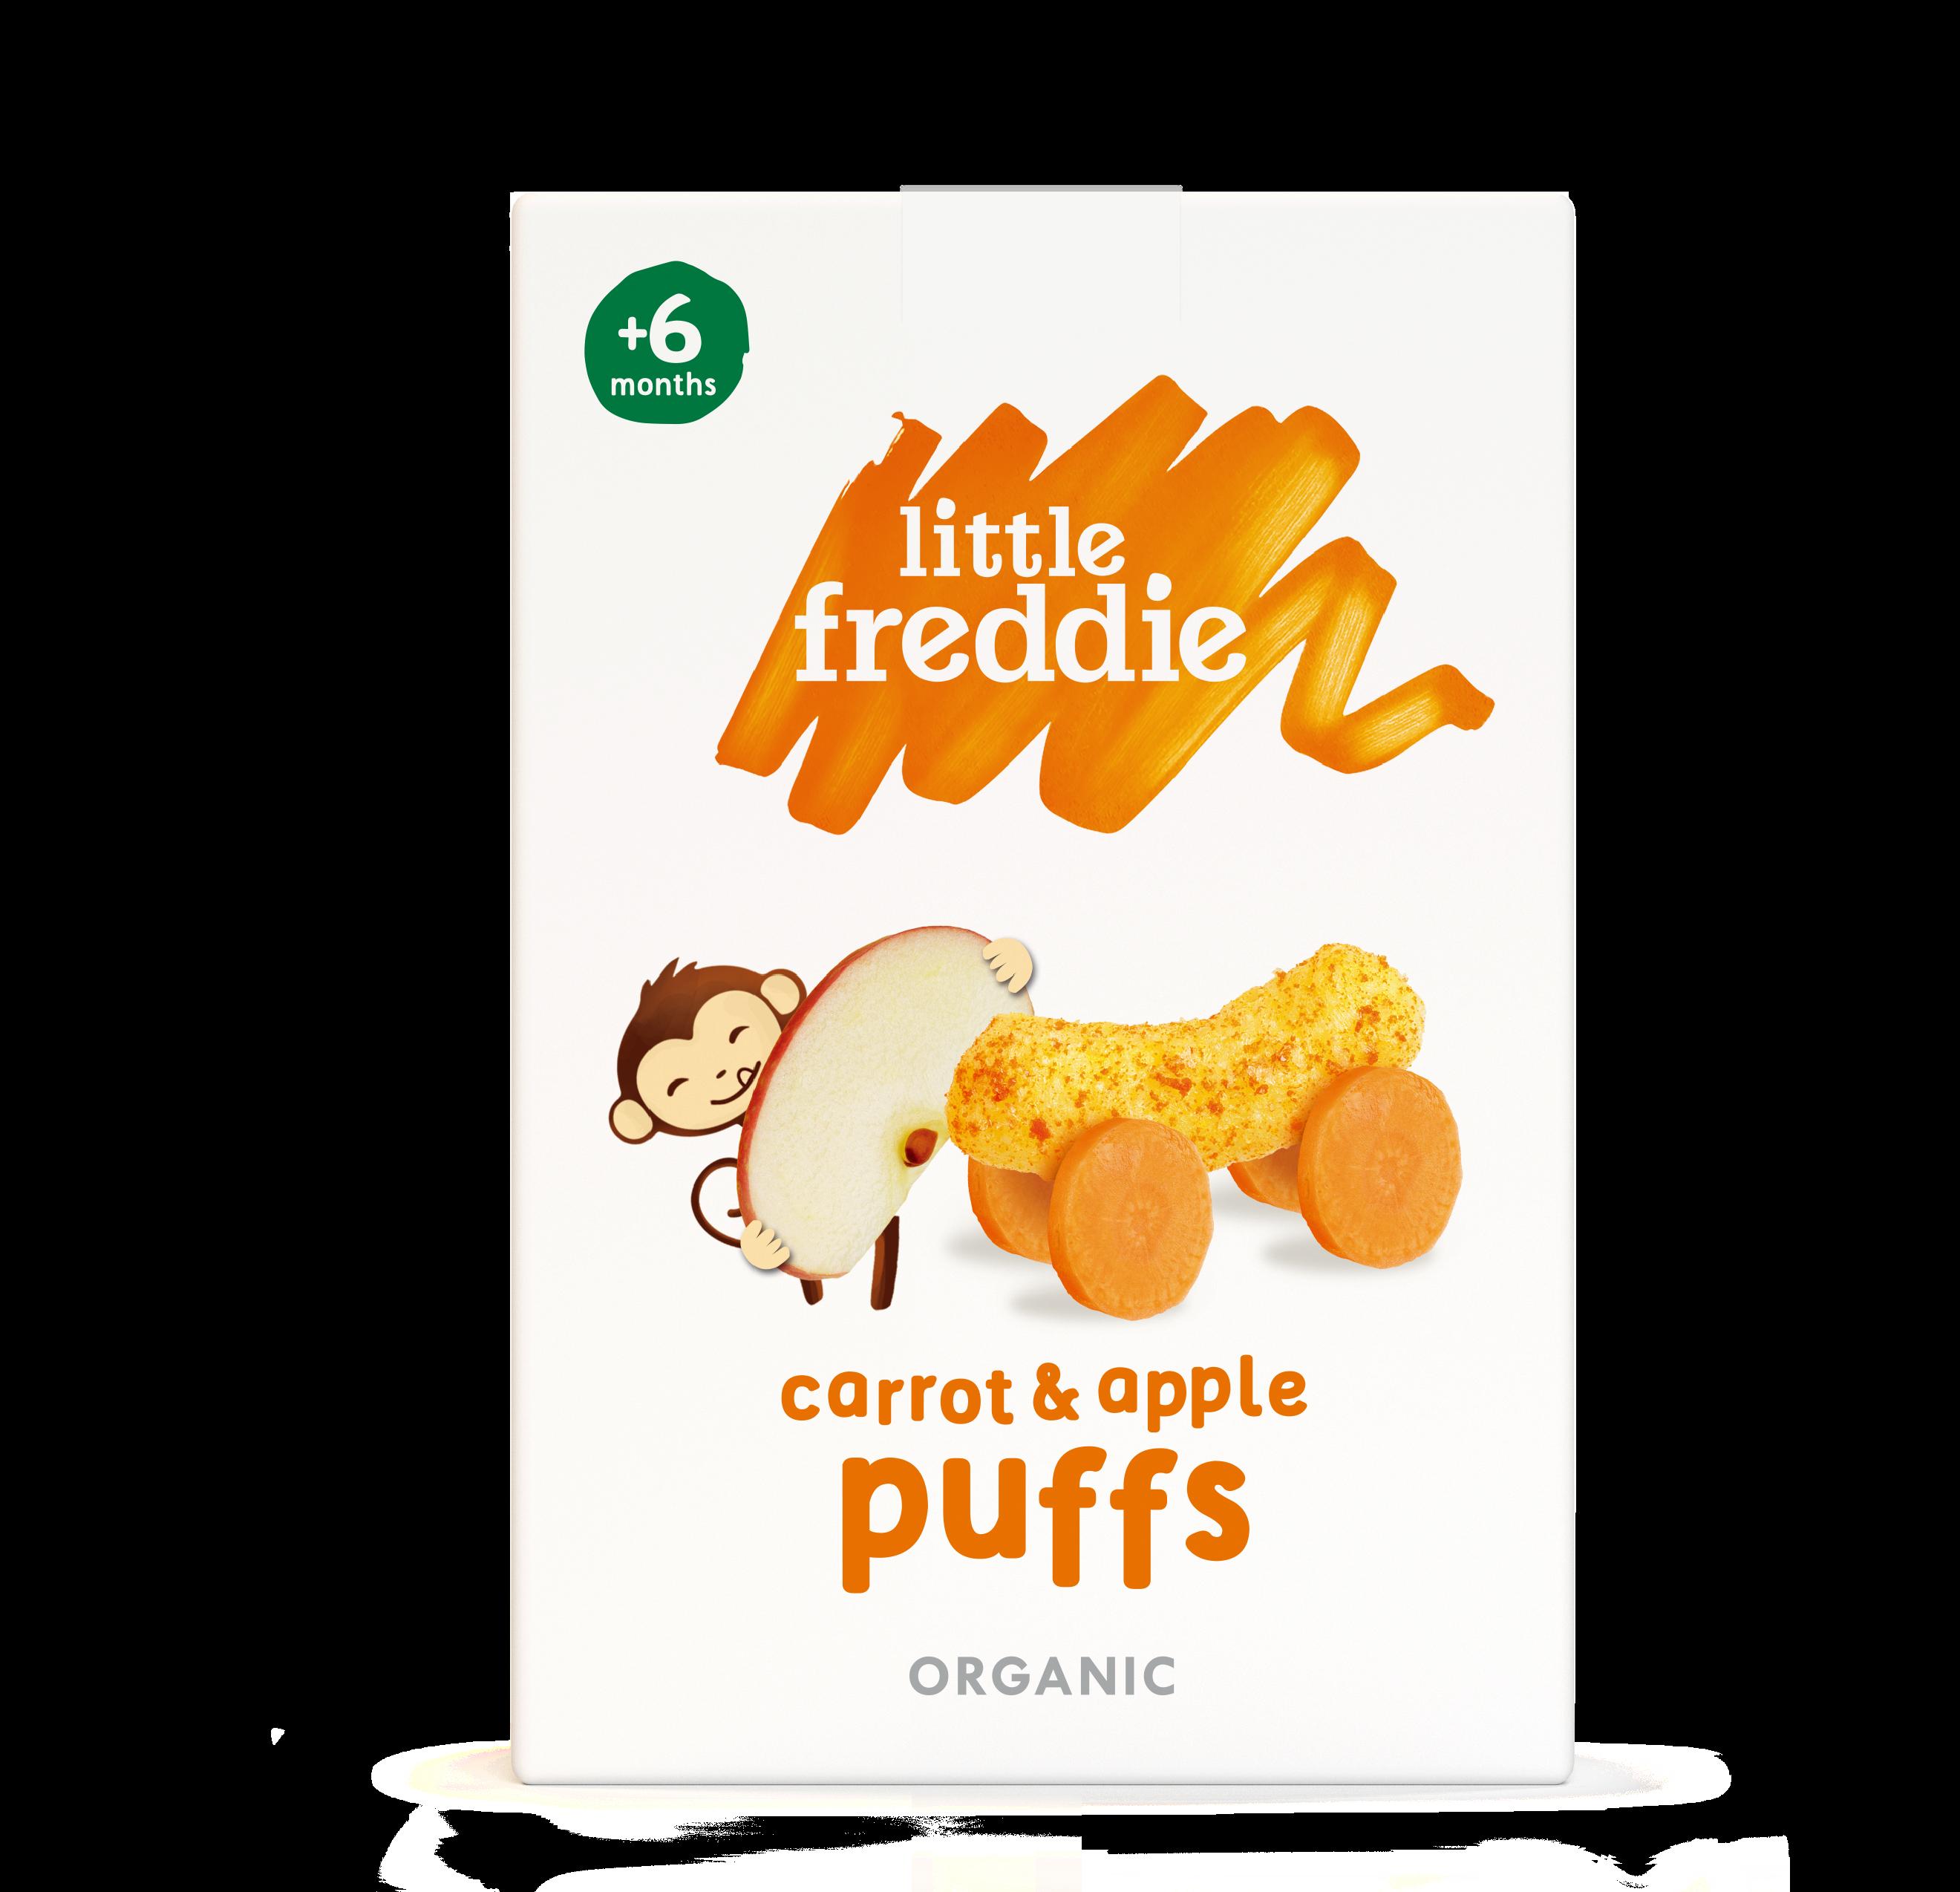 Little Freddie Carrot & Apple Puffs